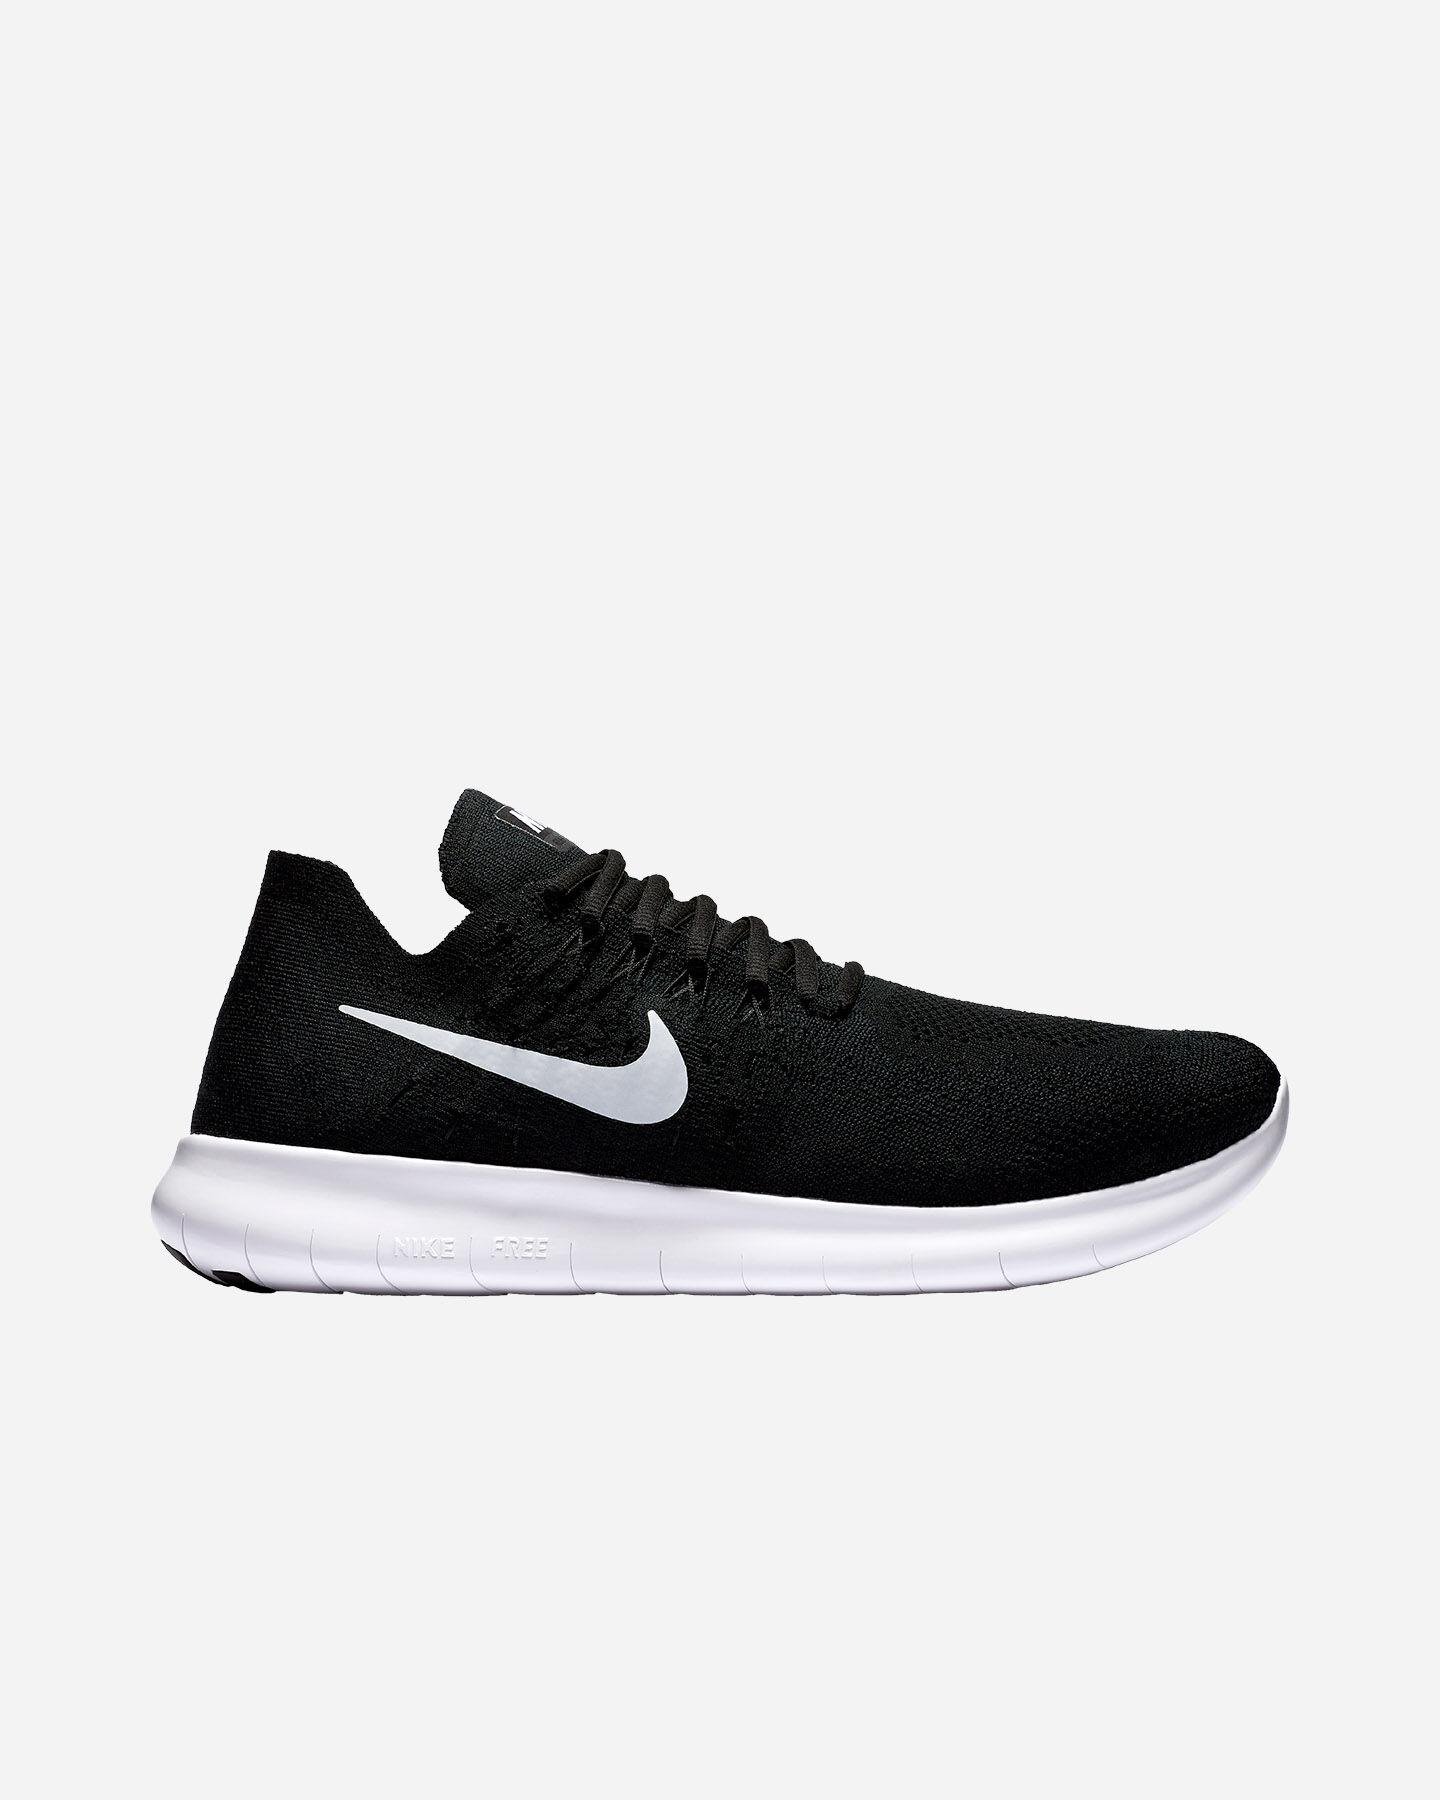 new style fd087 f991a Nike Free Rn Scarpe Uomo Scarpe da ginnastica Scarpe fitness cachi 43 44